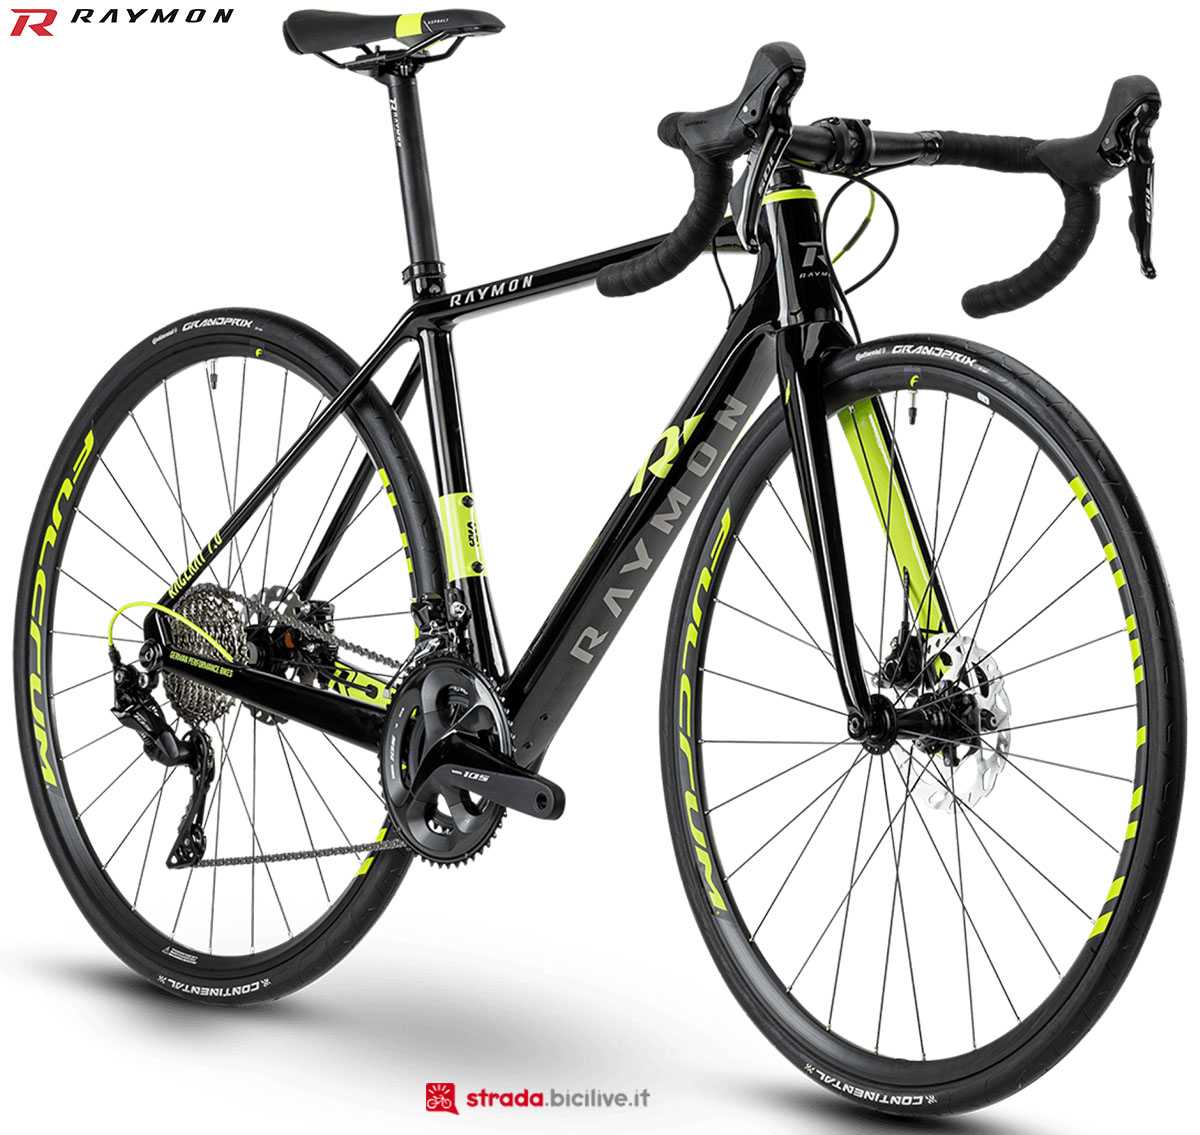 La bici R Raymon RACERAY 7.0 2020